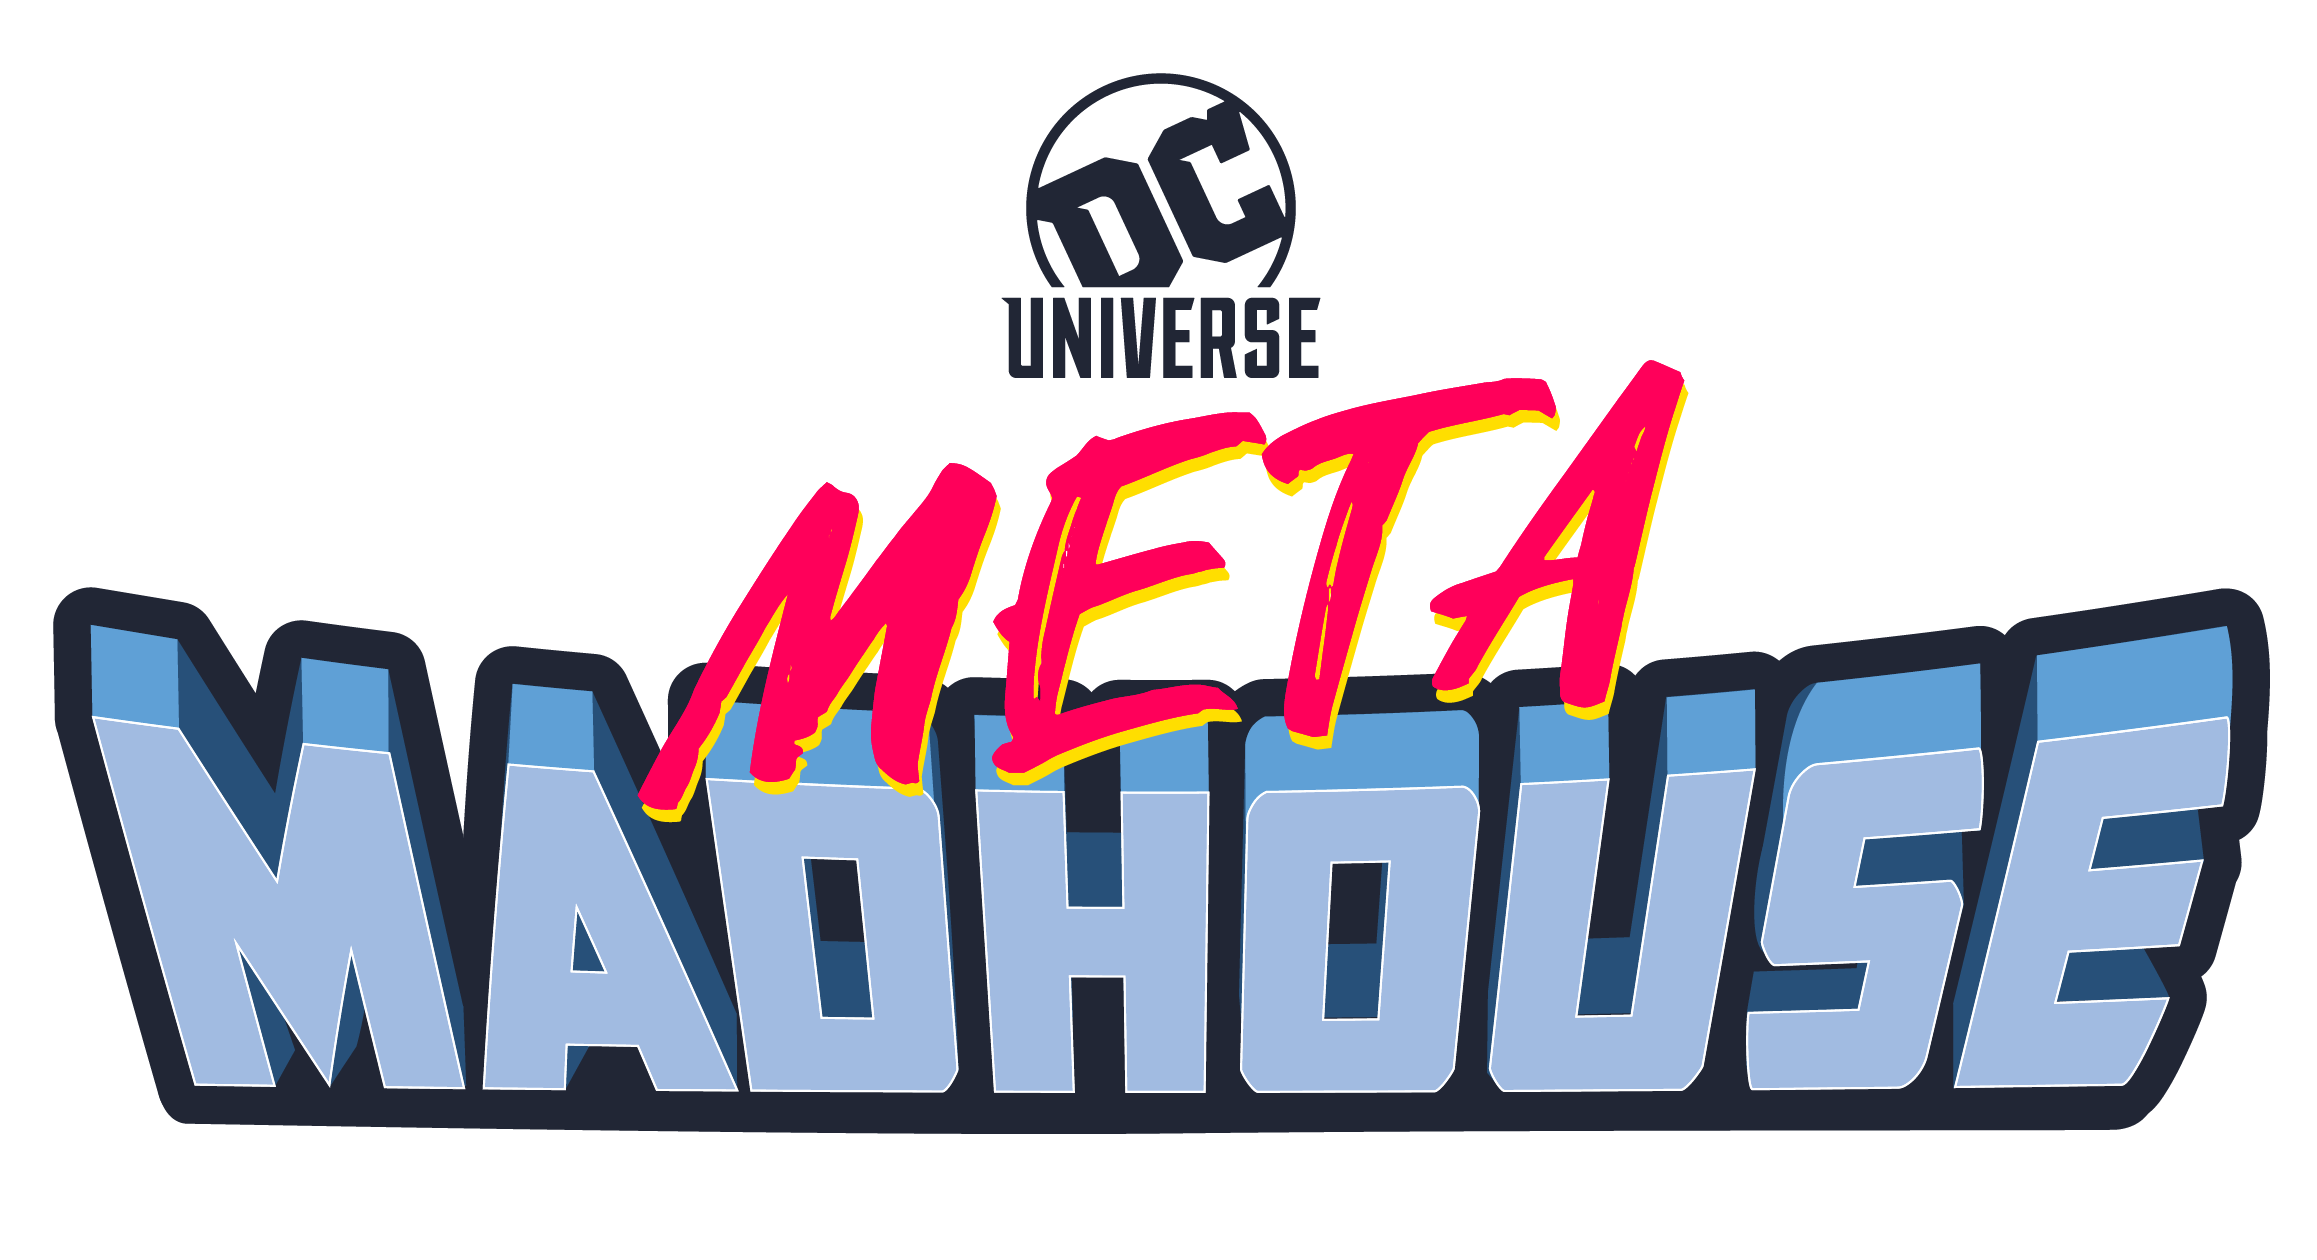 meta-madhouse-v3 (3).png